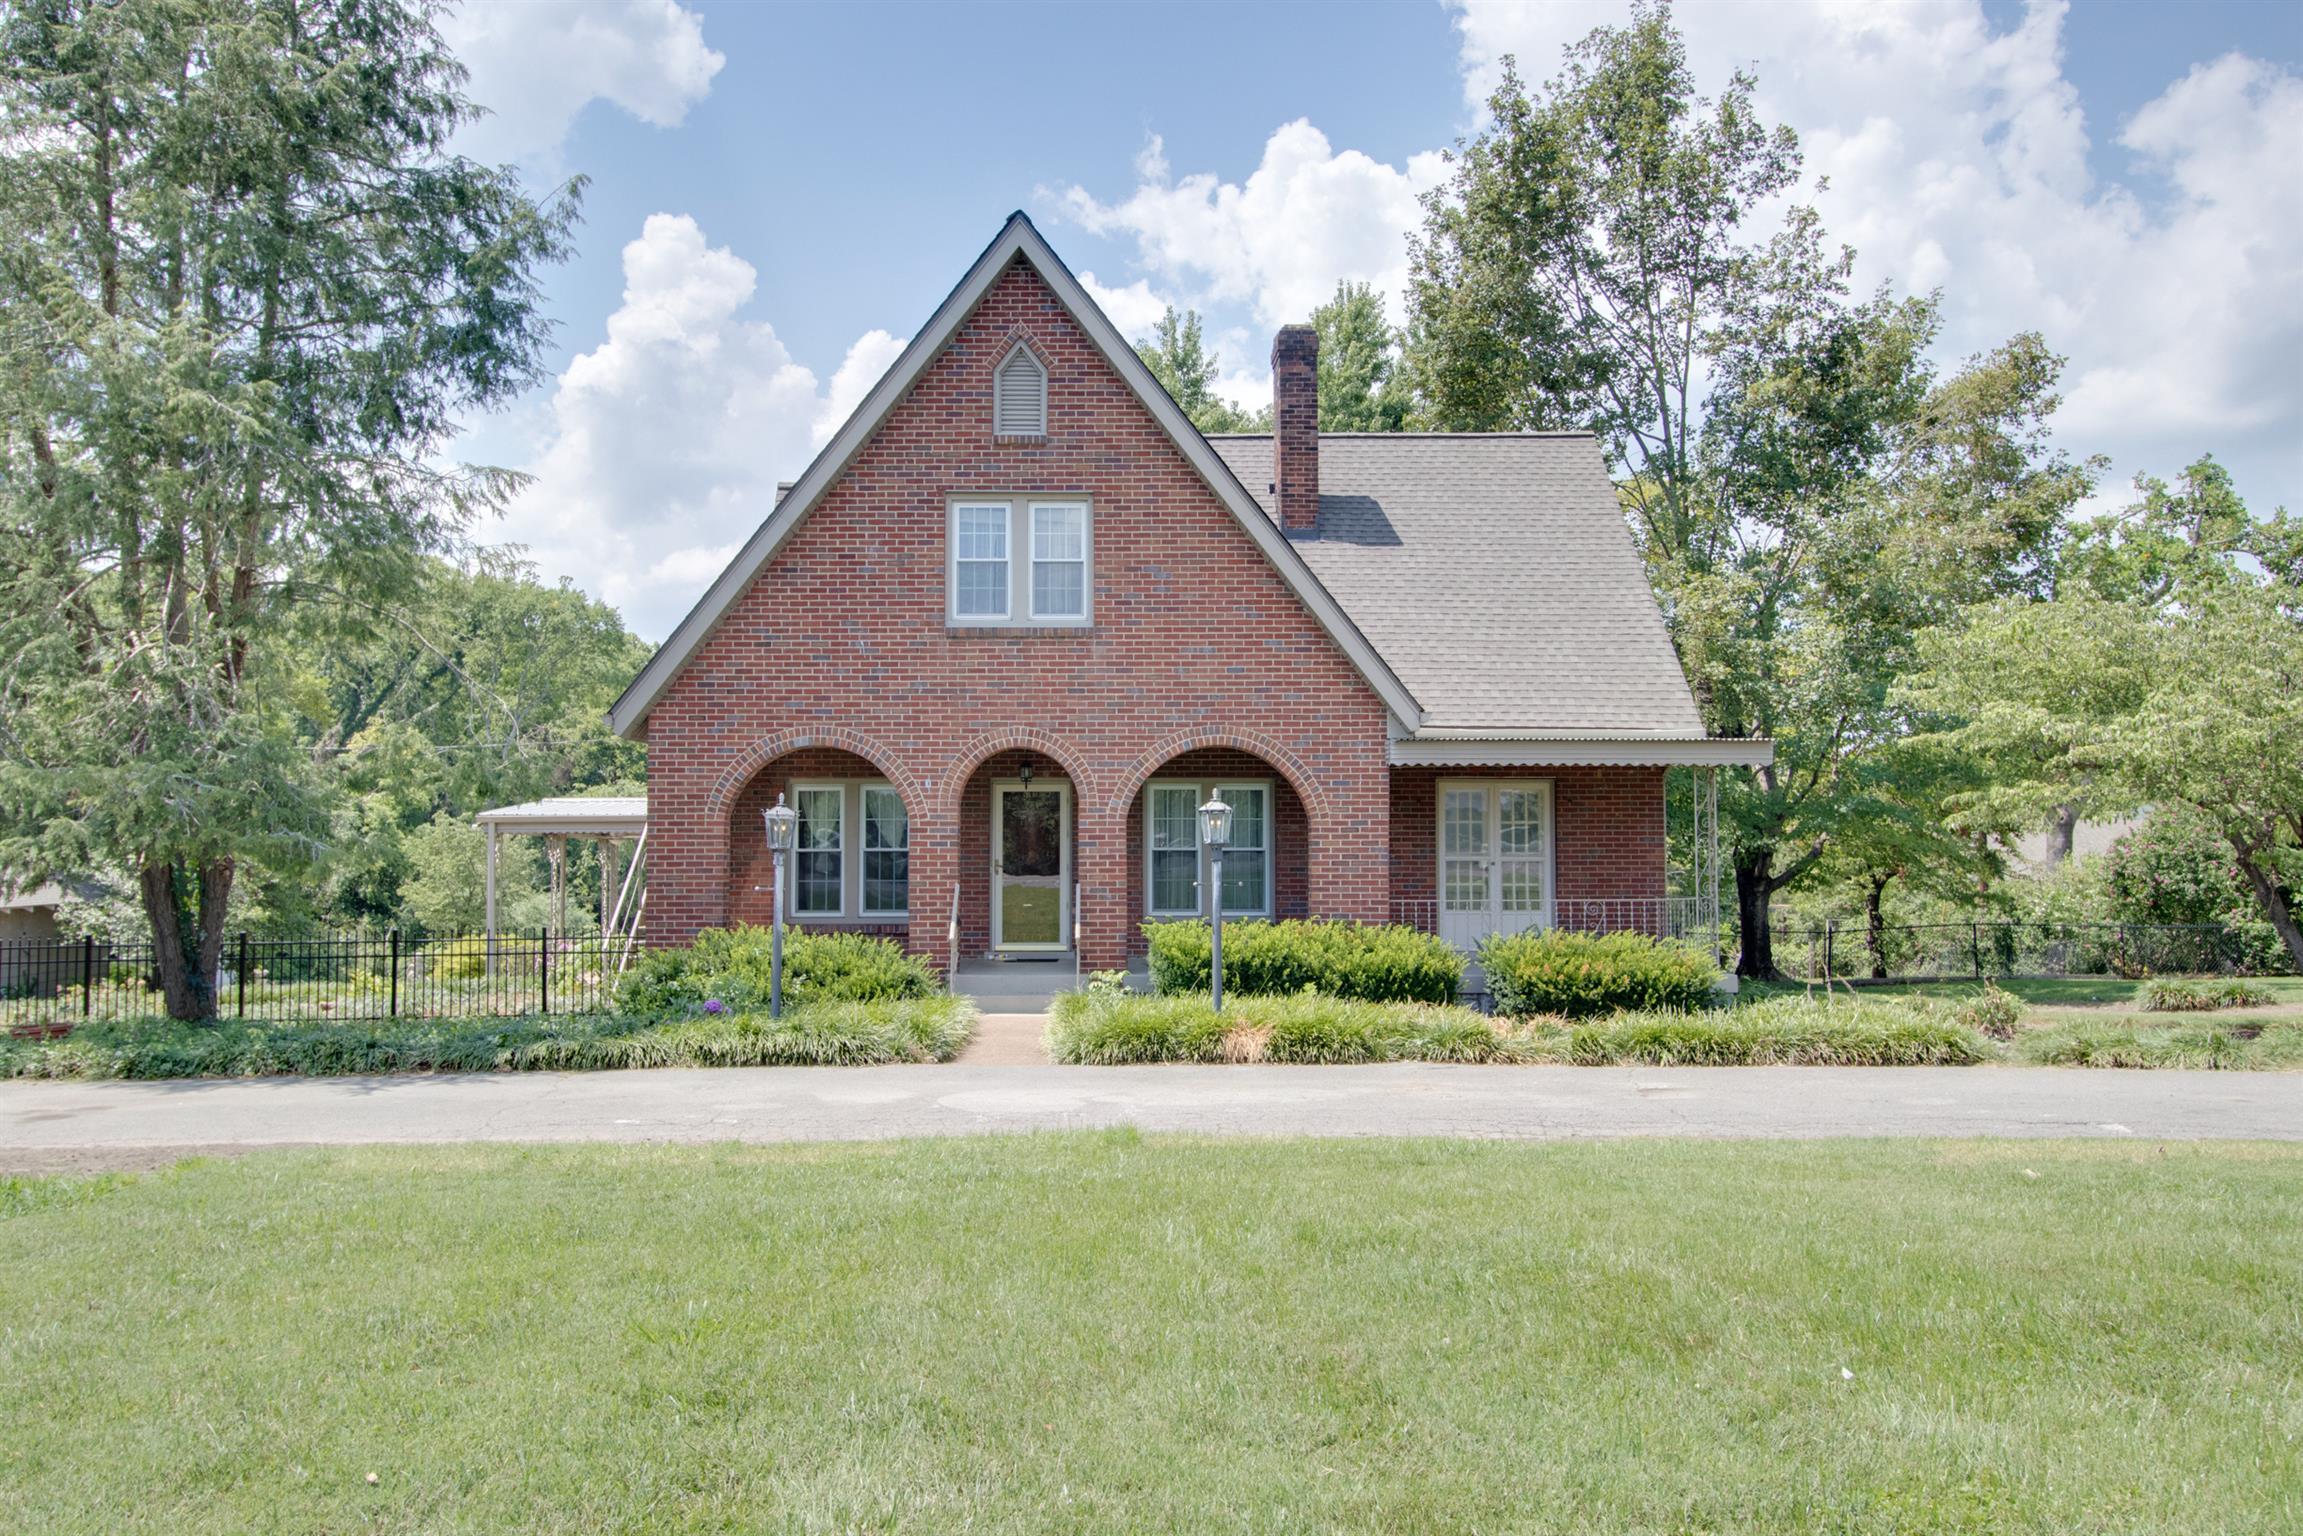 3036 Lebanon Pike, Nashville, TN 37214 - Nashville, TN real estate listing